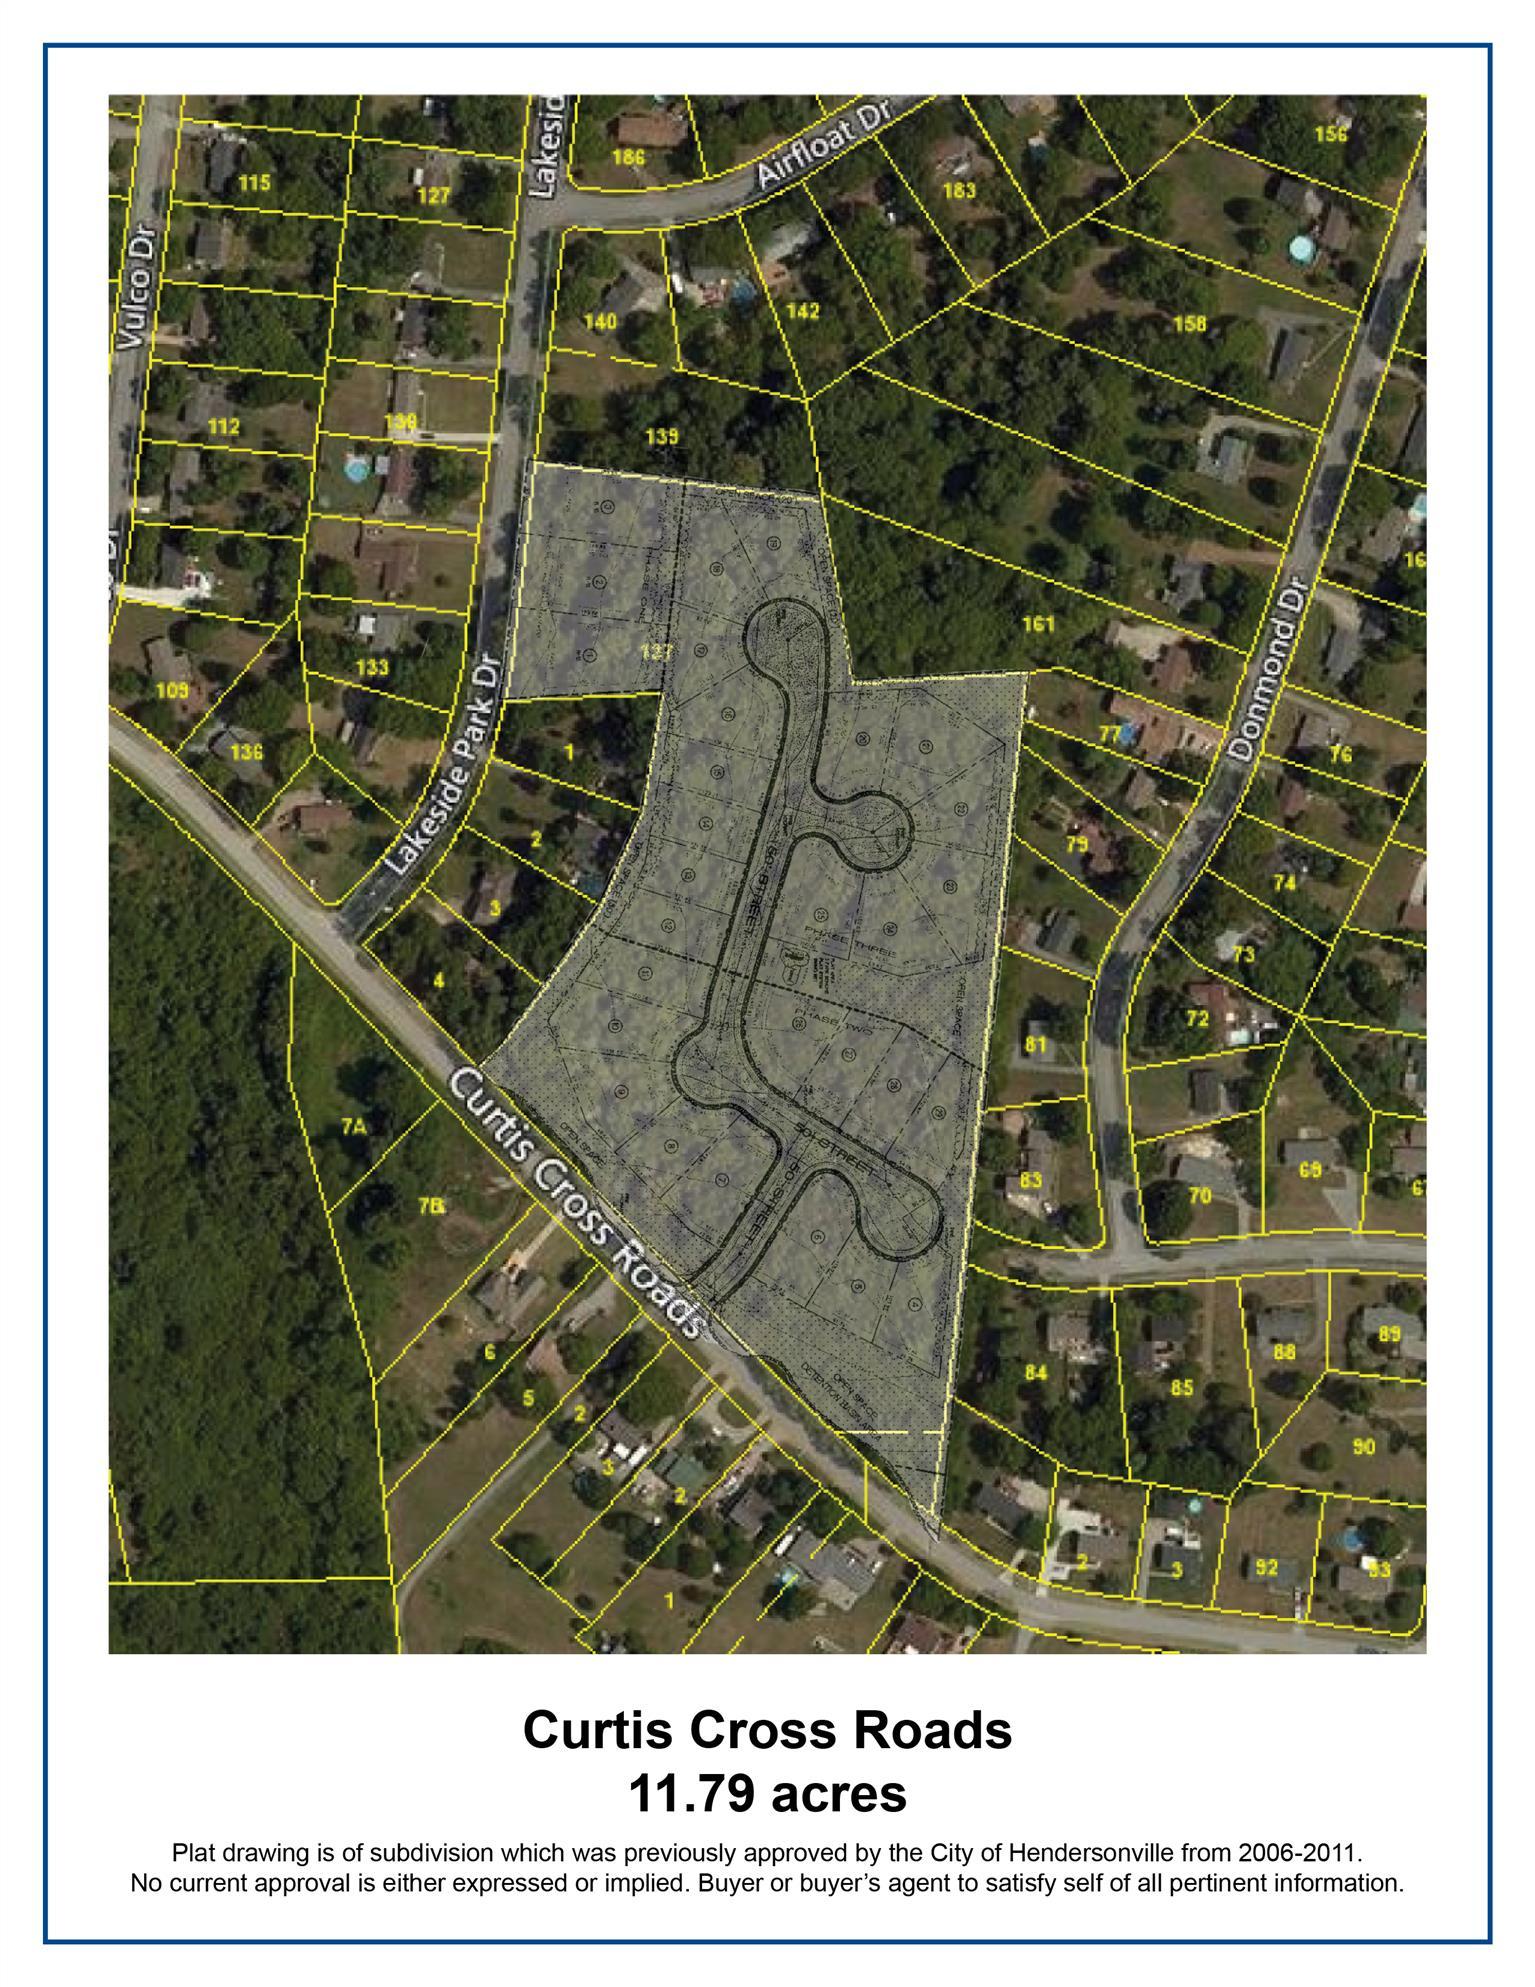 0 Curtis Cross Rds, Hendersonville, TN 37075